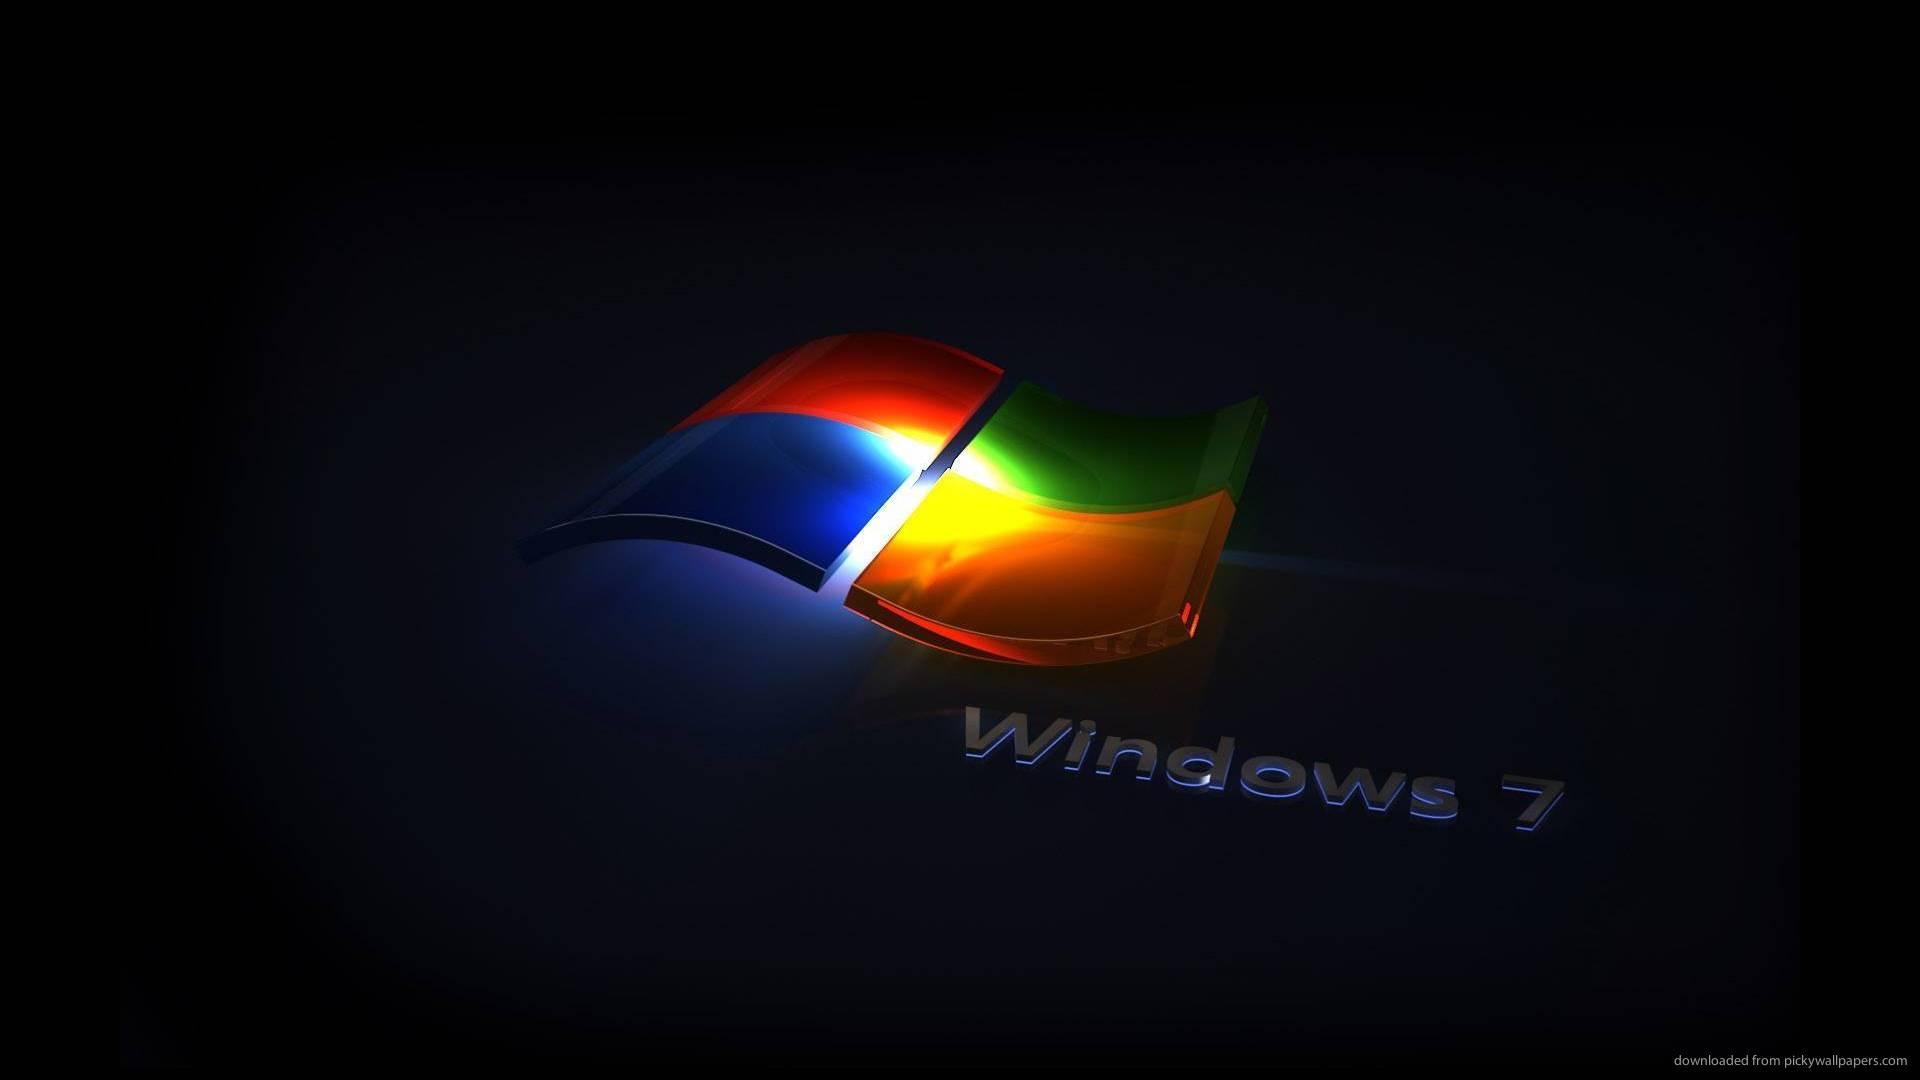 windows 7 wallpaper hd 1920x1080 wallpaper 565143 windows wallpaper 1920x1080